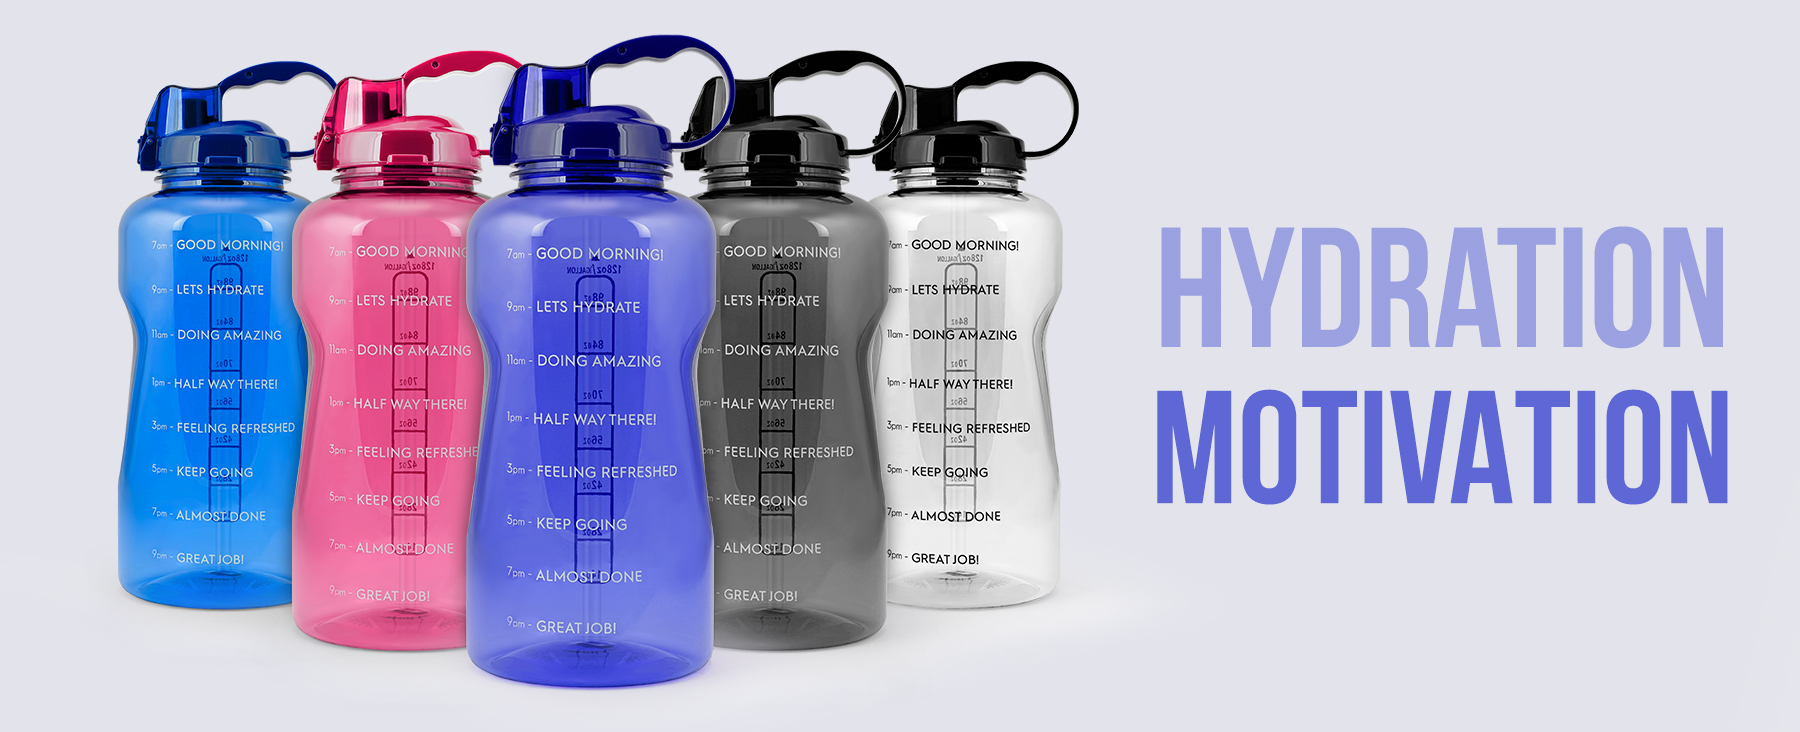 hydration motivations